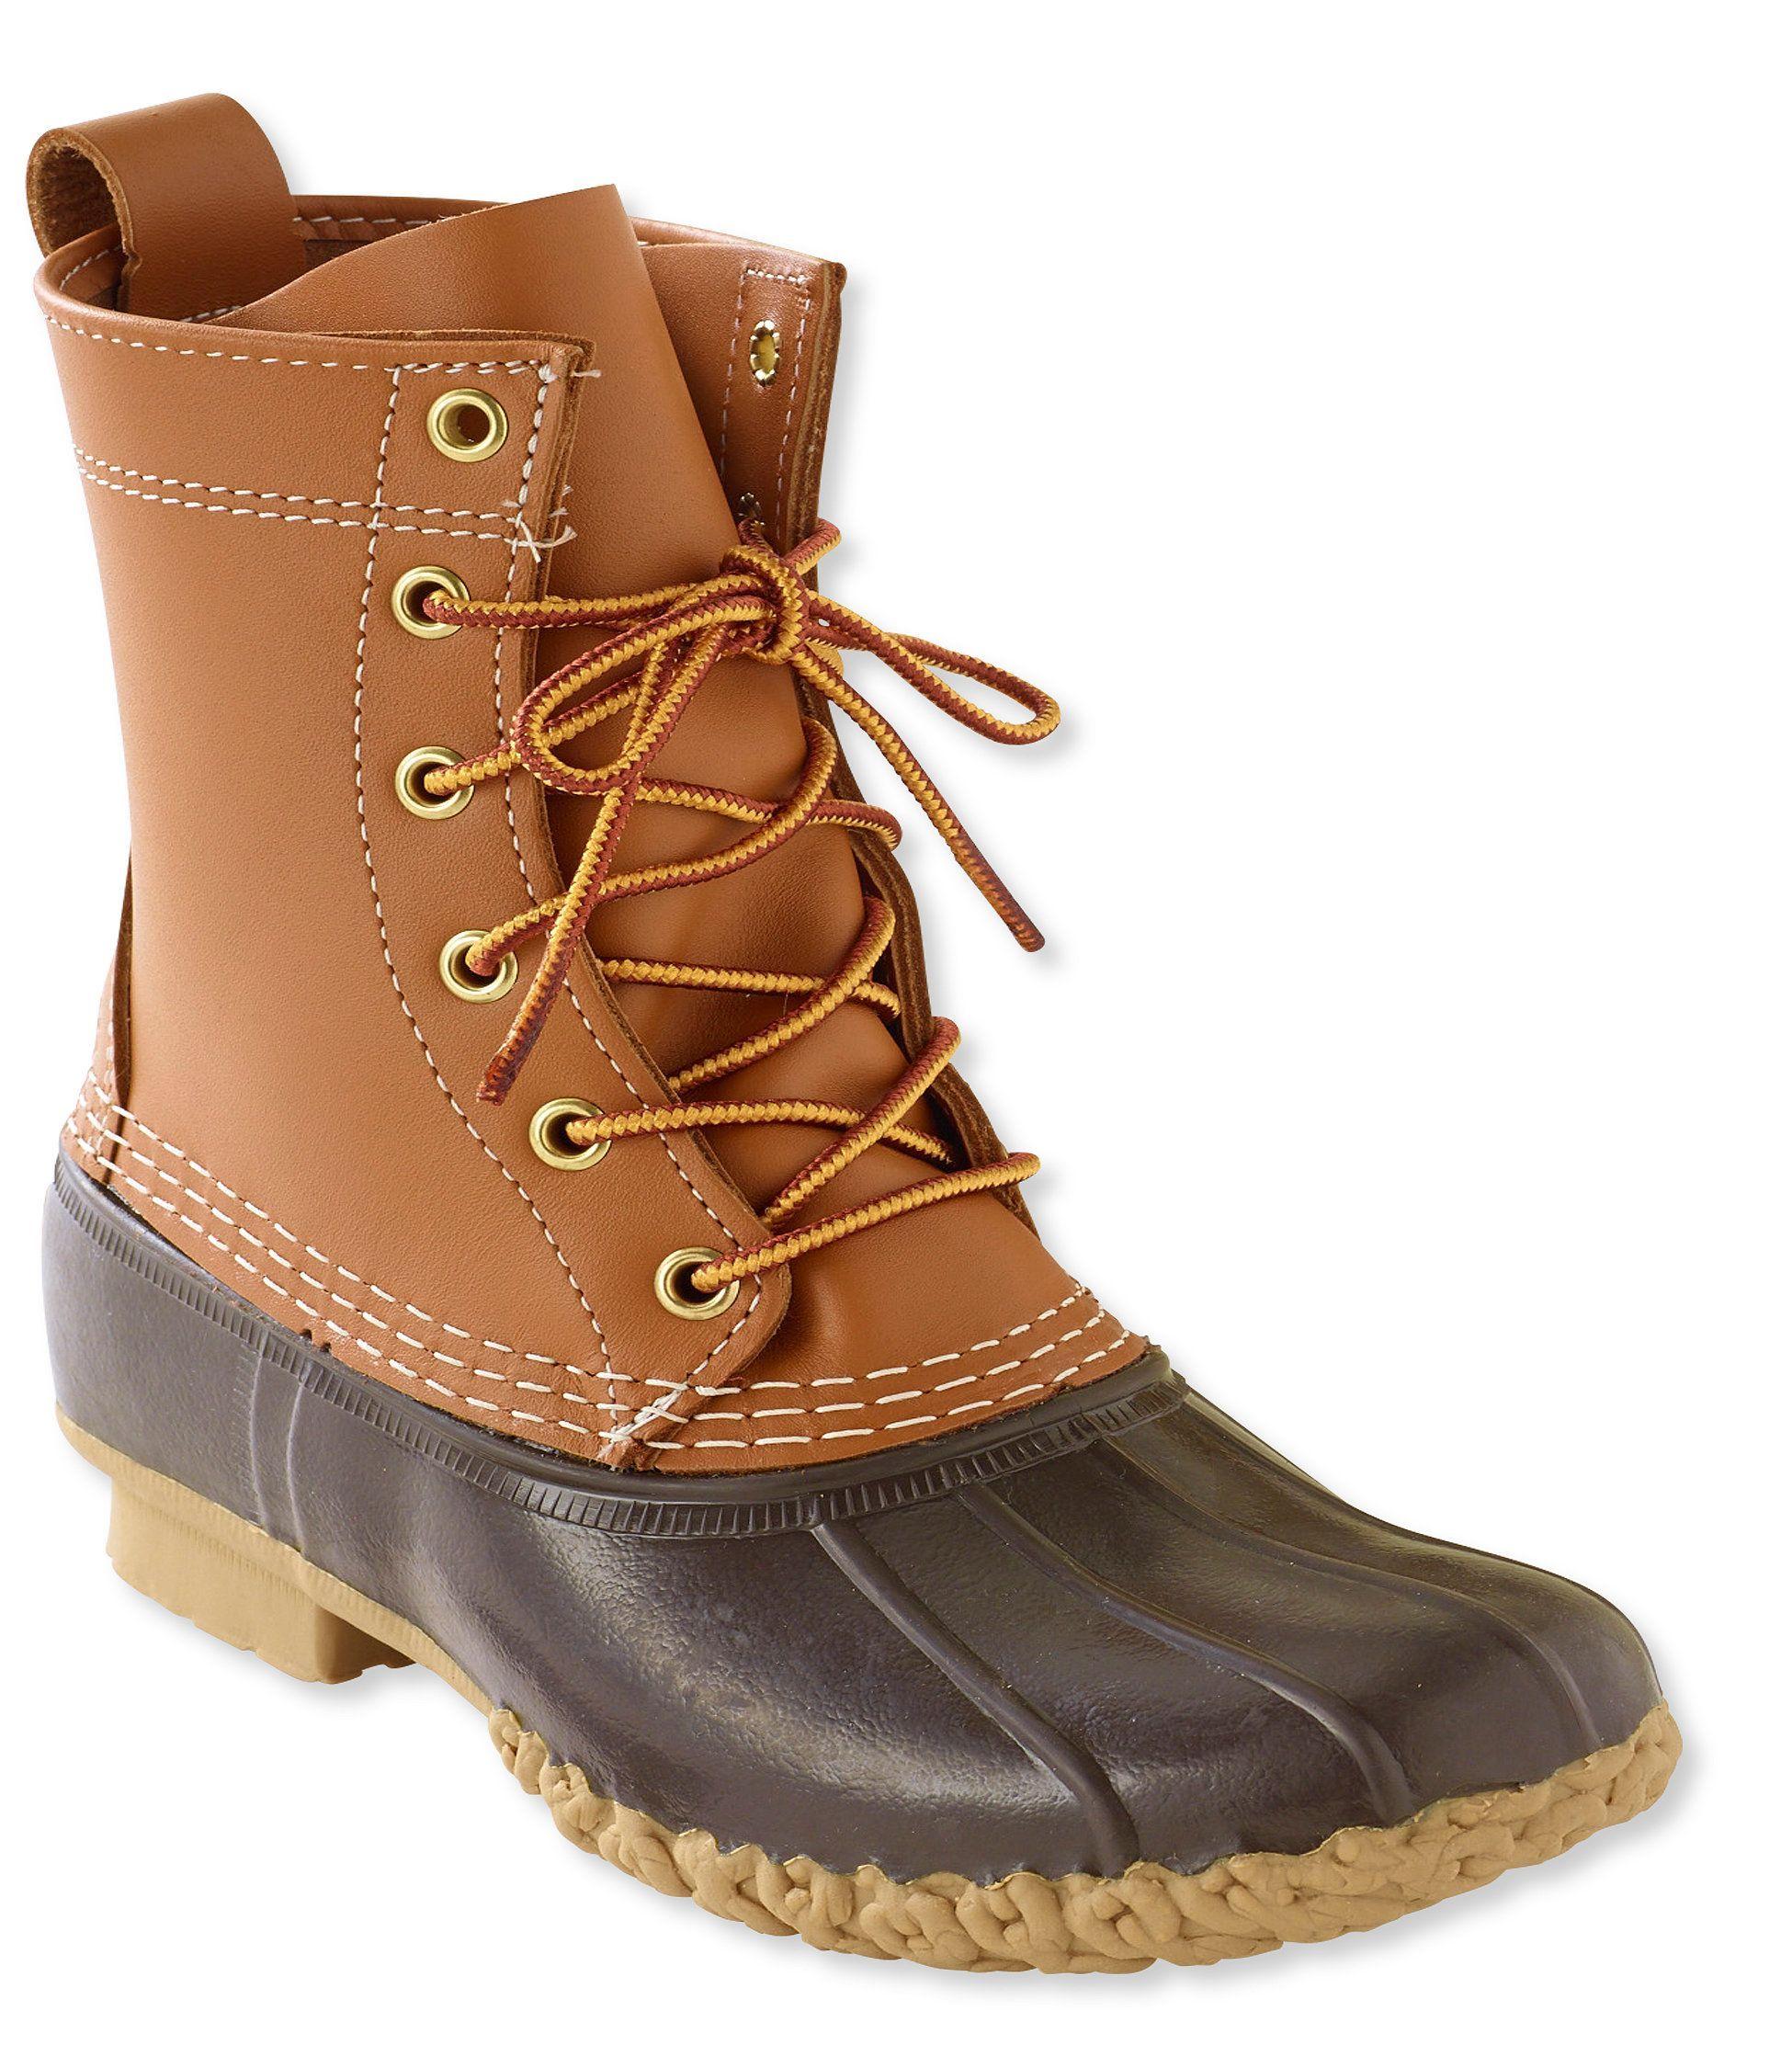 Kids' L.L.Bean Boots, Thinsulate   Ll